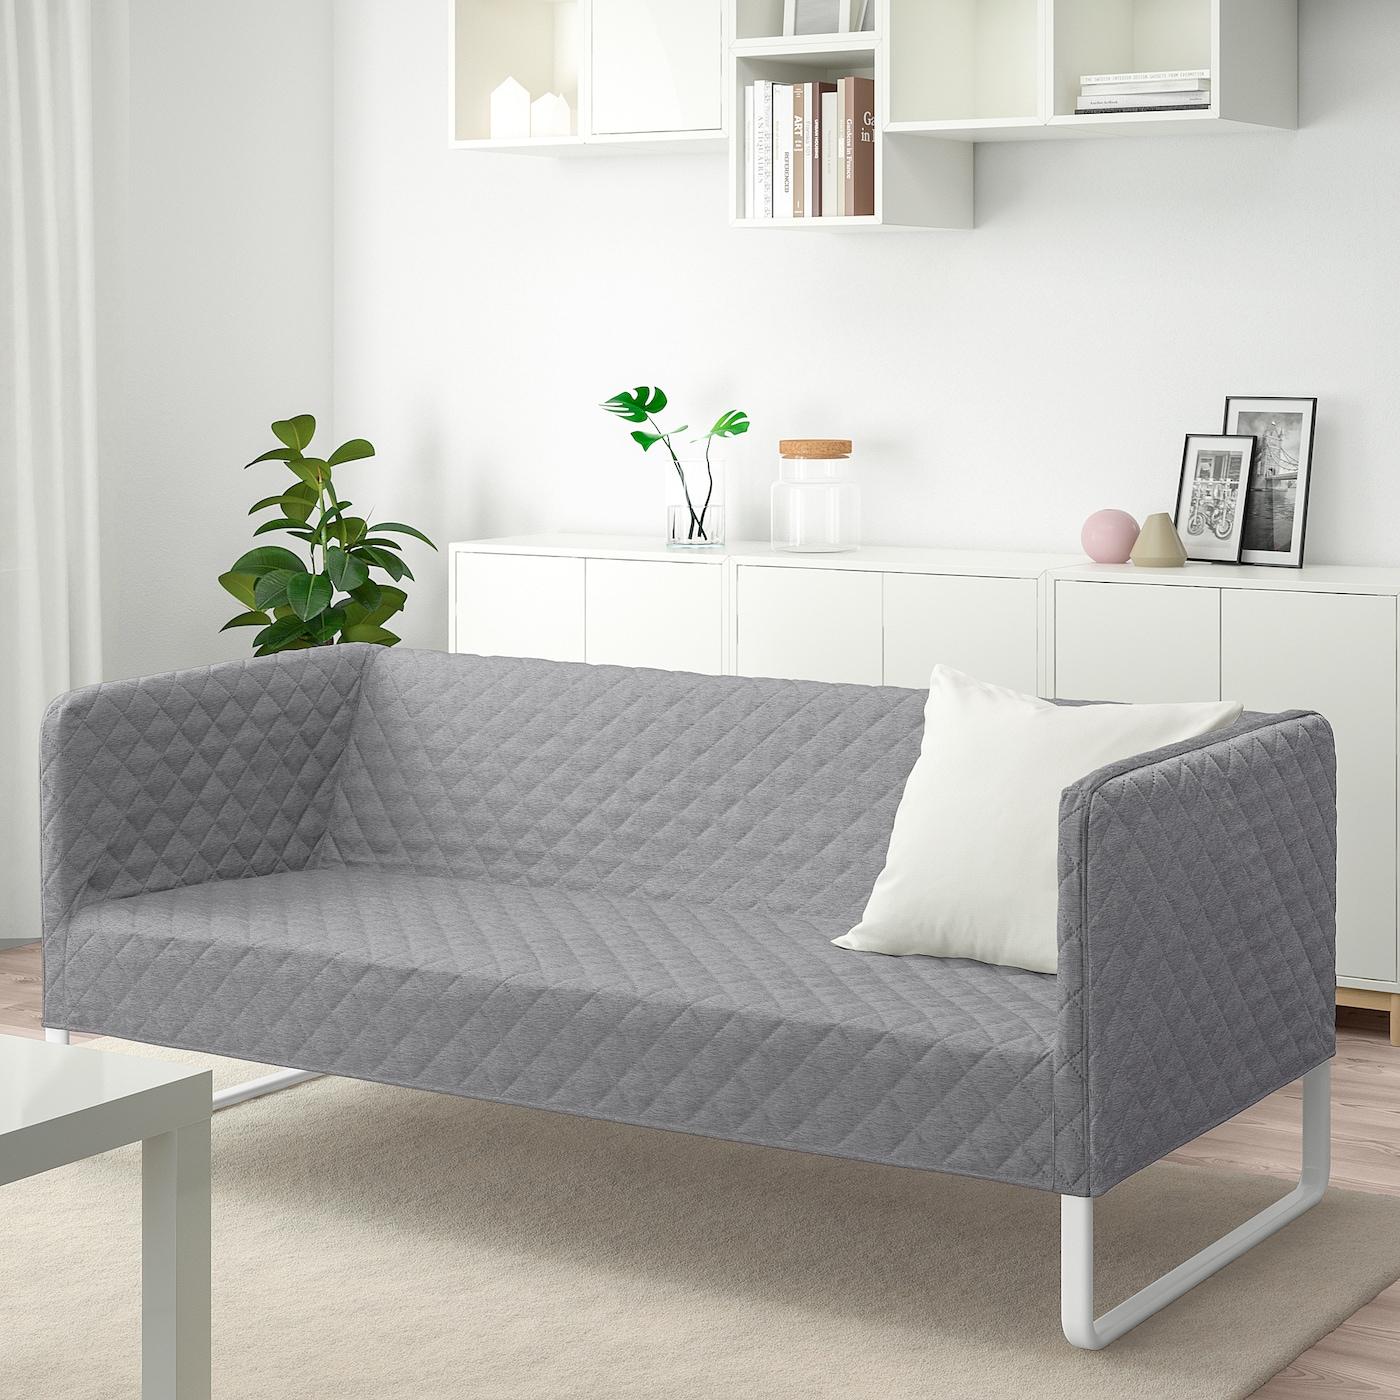 KNOPPARP Sofa, Knisa light gray